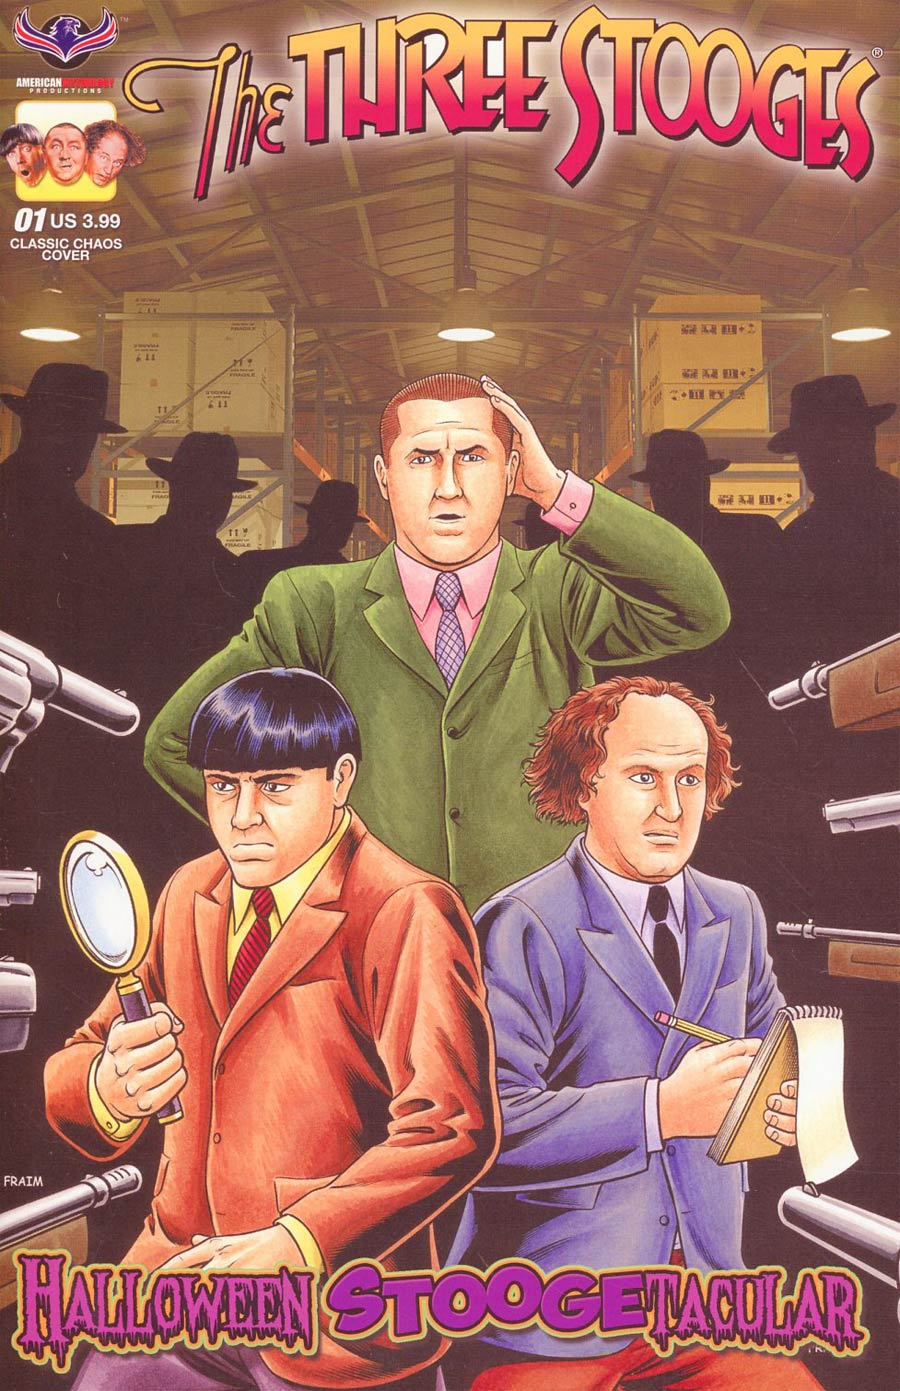 Three Stooges Halloween Stoogetacular Cover B Variant Brendon Fraim & Brian Fraim Framed Cover